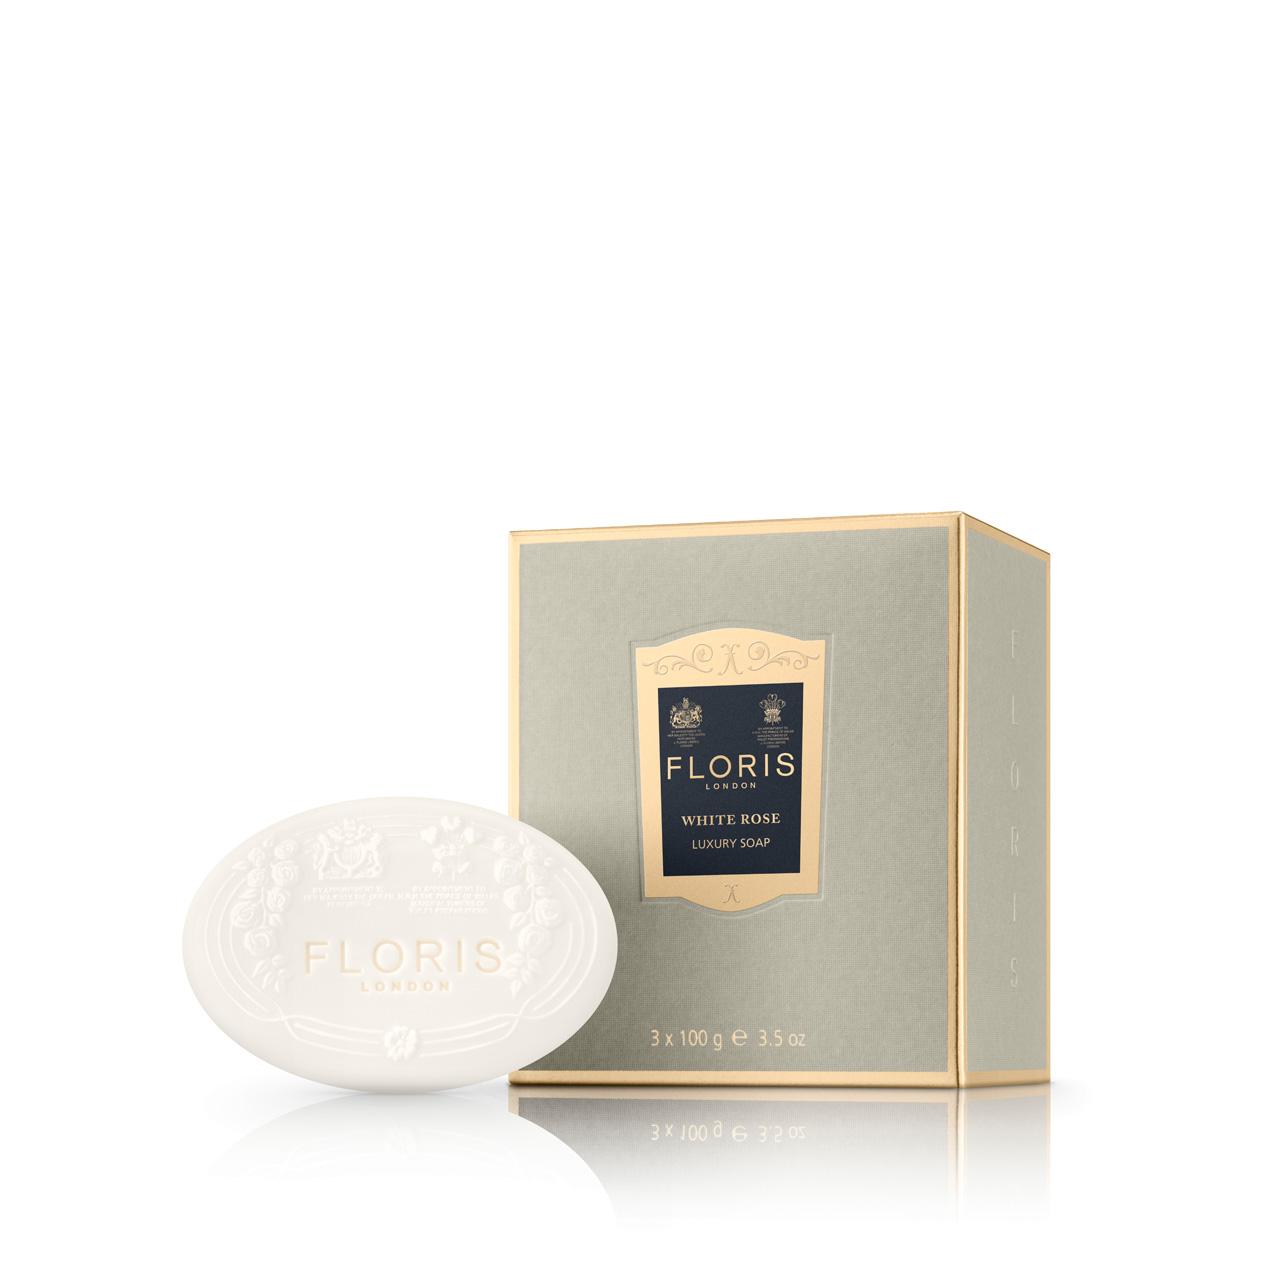 White Rose - Toilet Soap